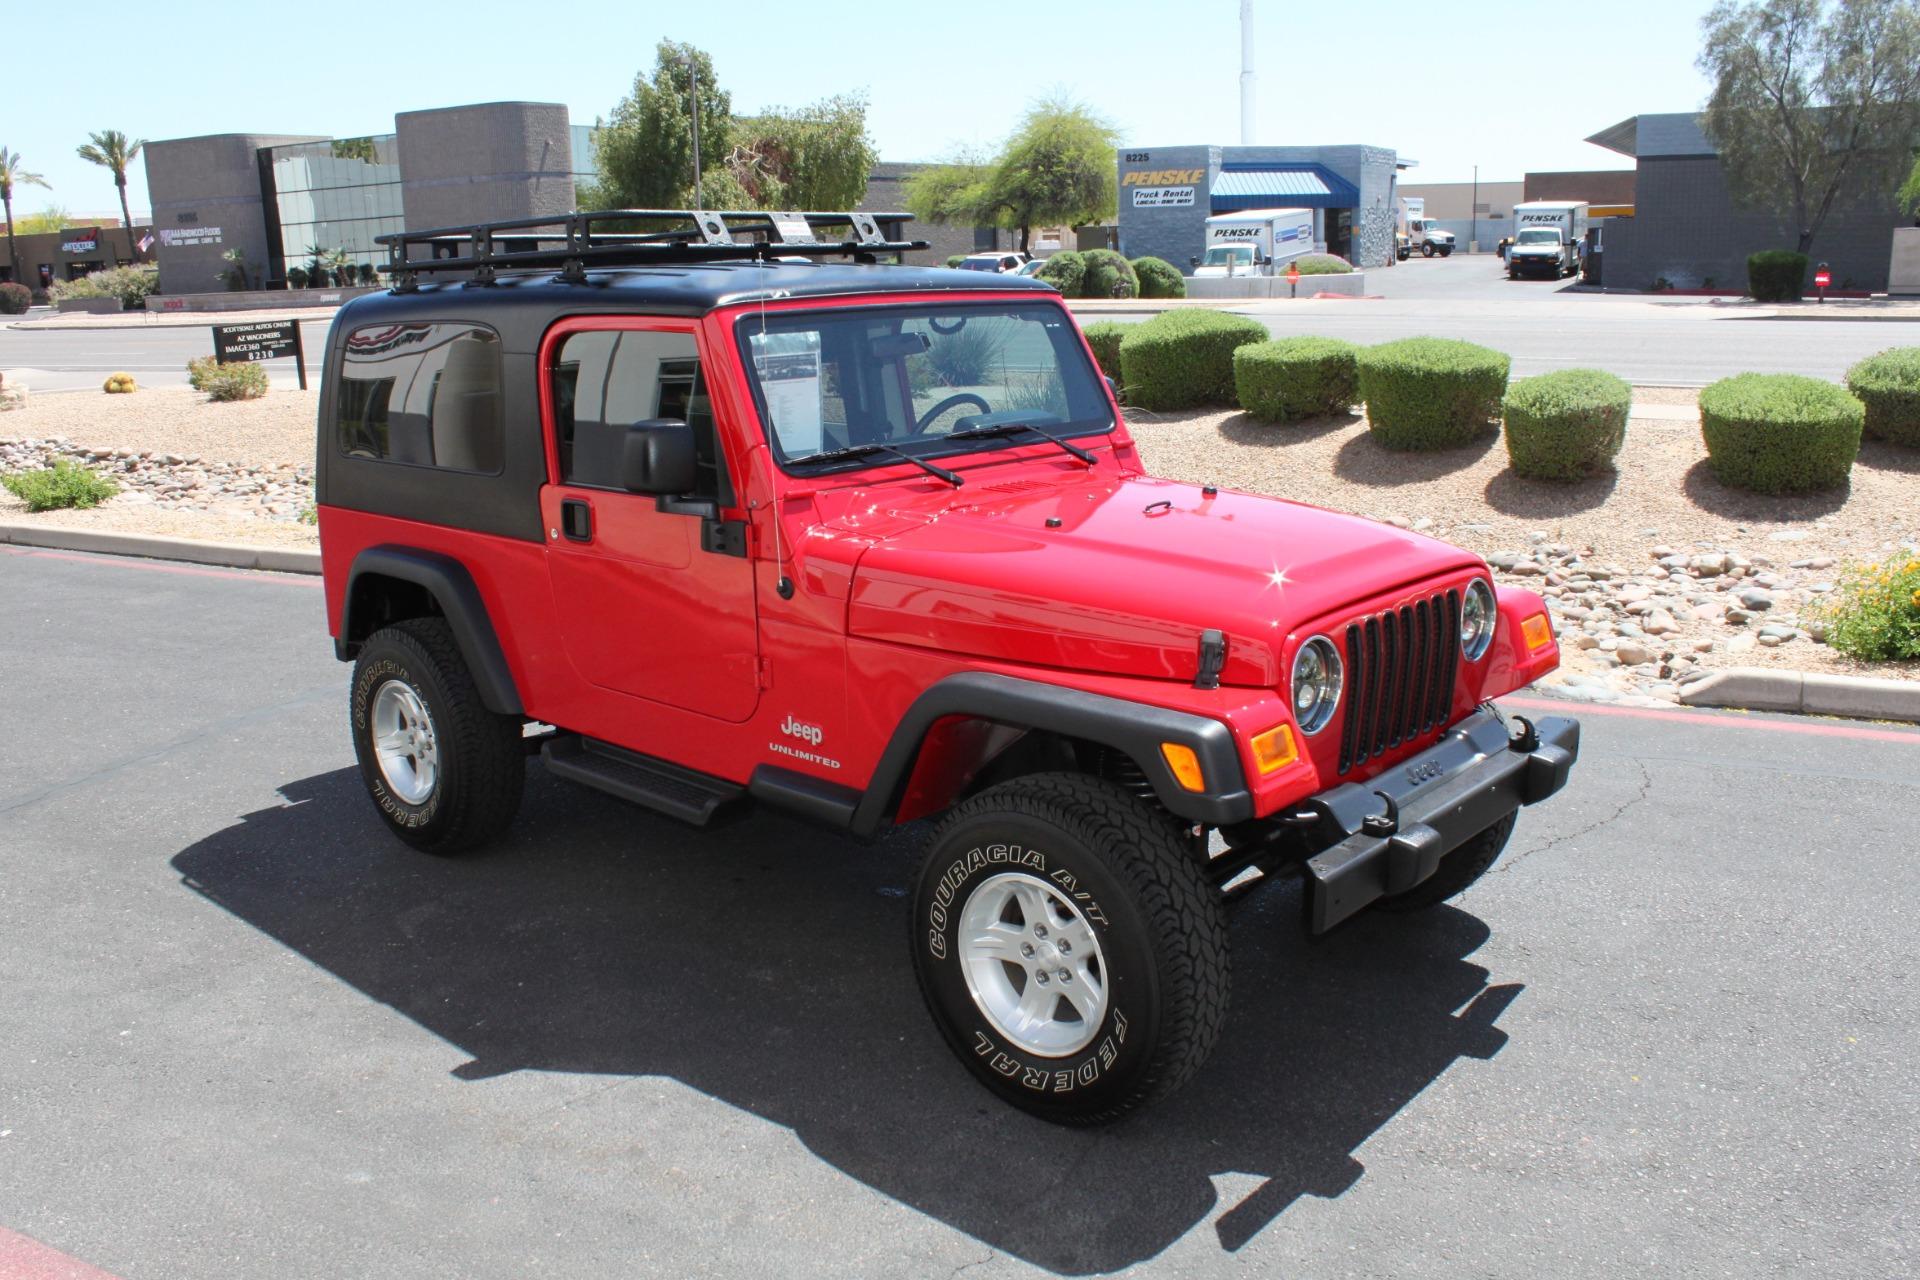 Used-2006-Jeep-Wrangler-4X4-LJ-Unlimited-LWB-Camaro